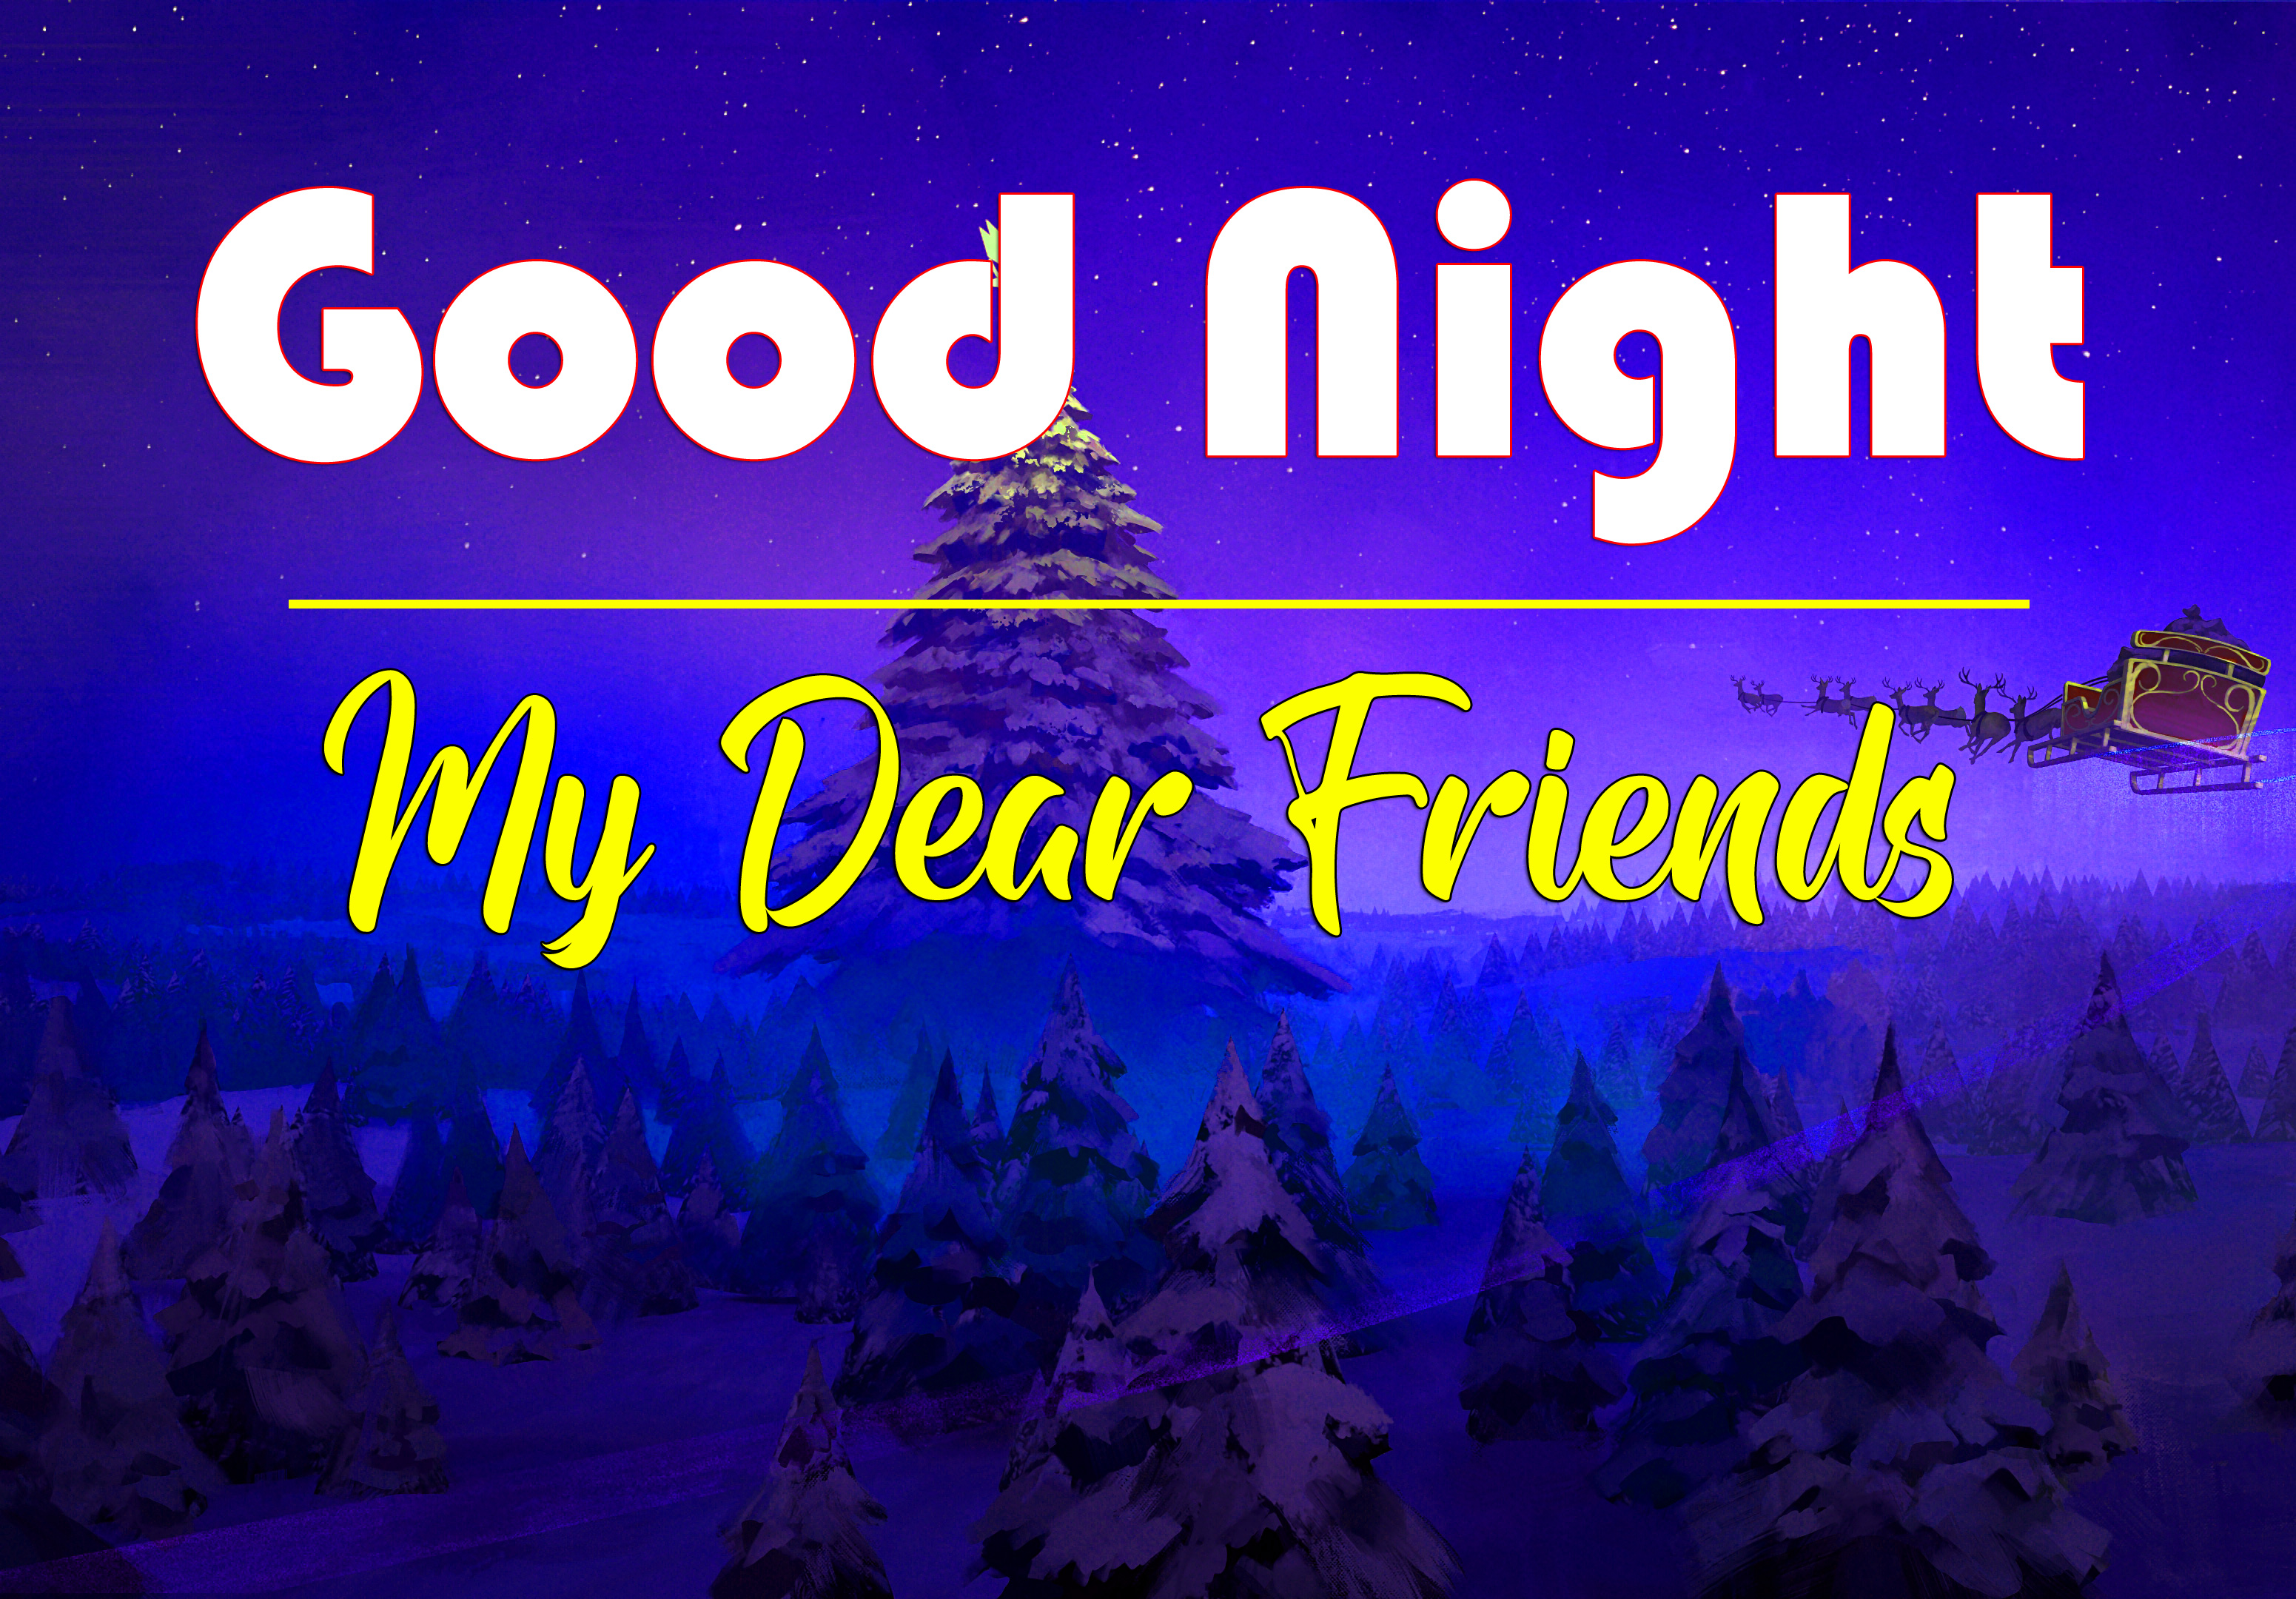 4k Good Night Images Wallpaper New Download